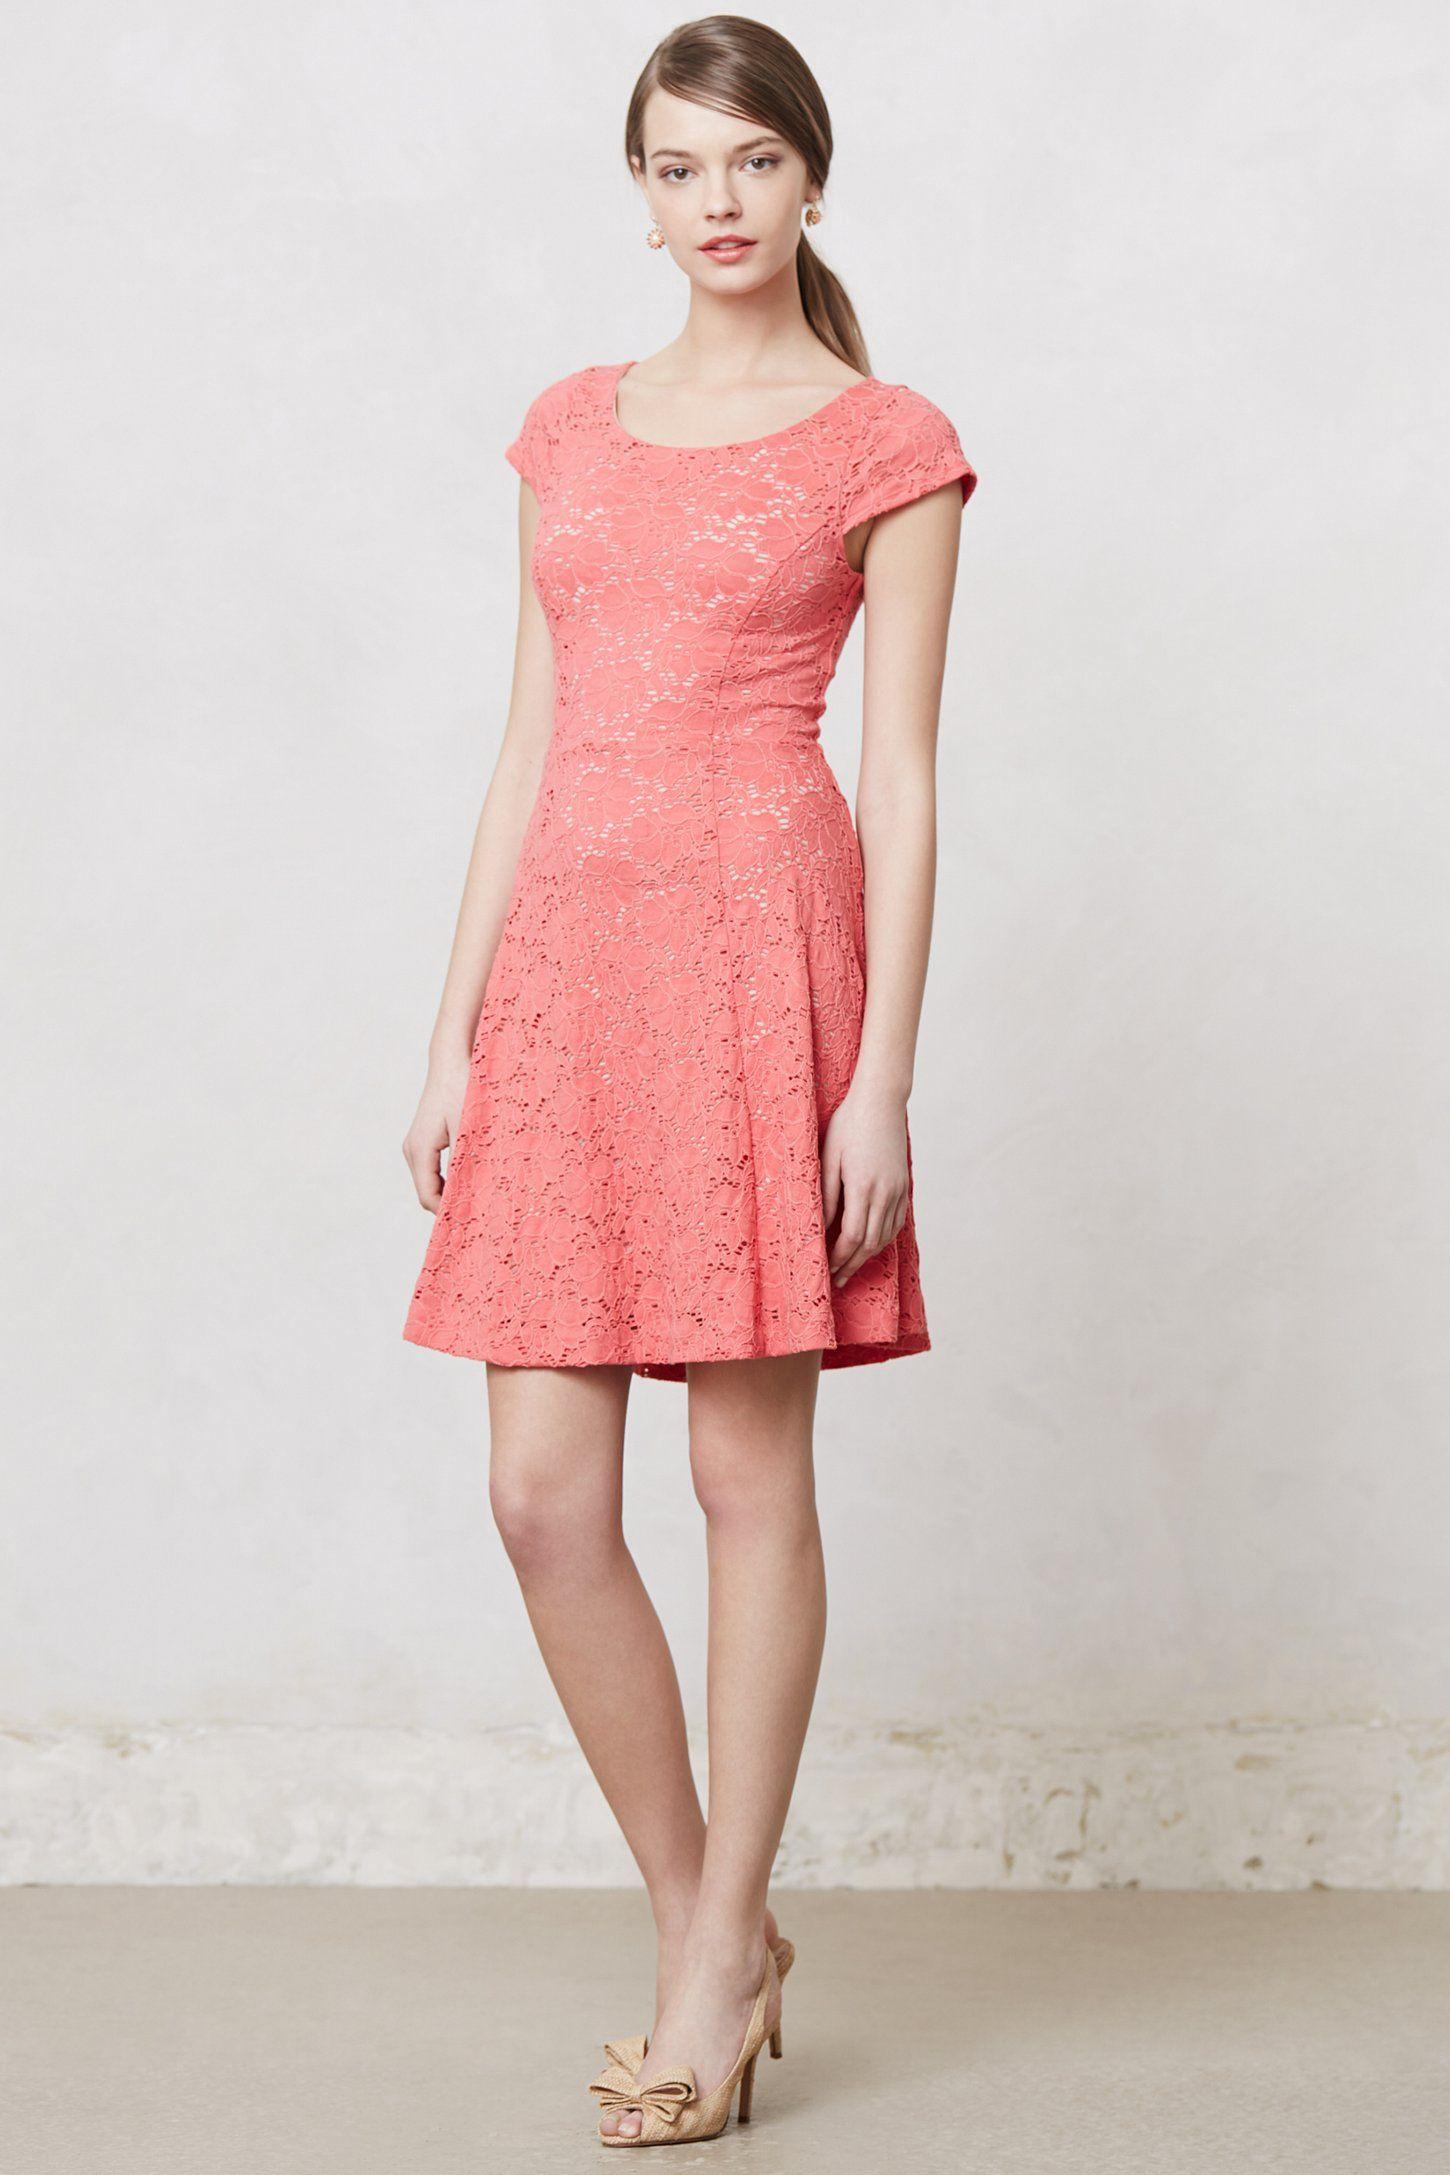 Dayflower Lace Dress - Anthropologie.com | Fashion | Pinterest